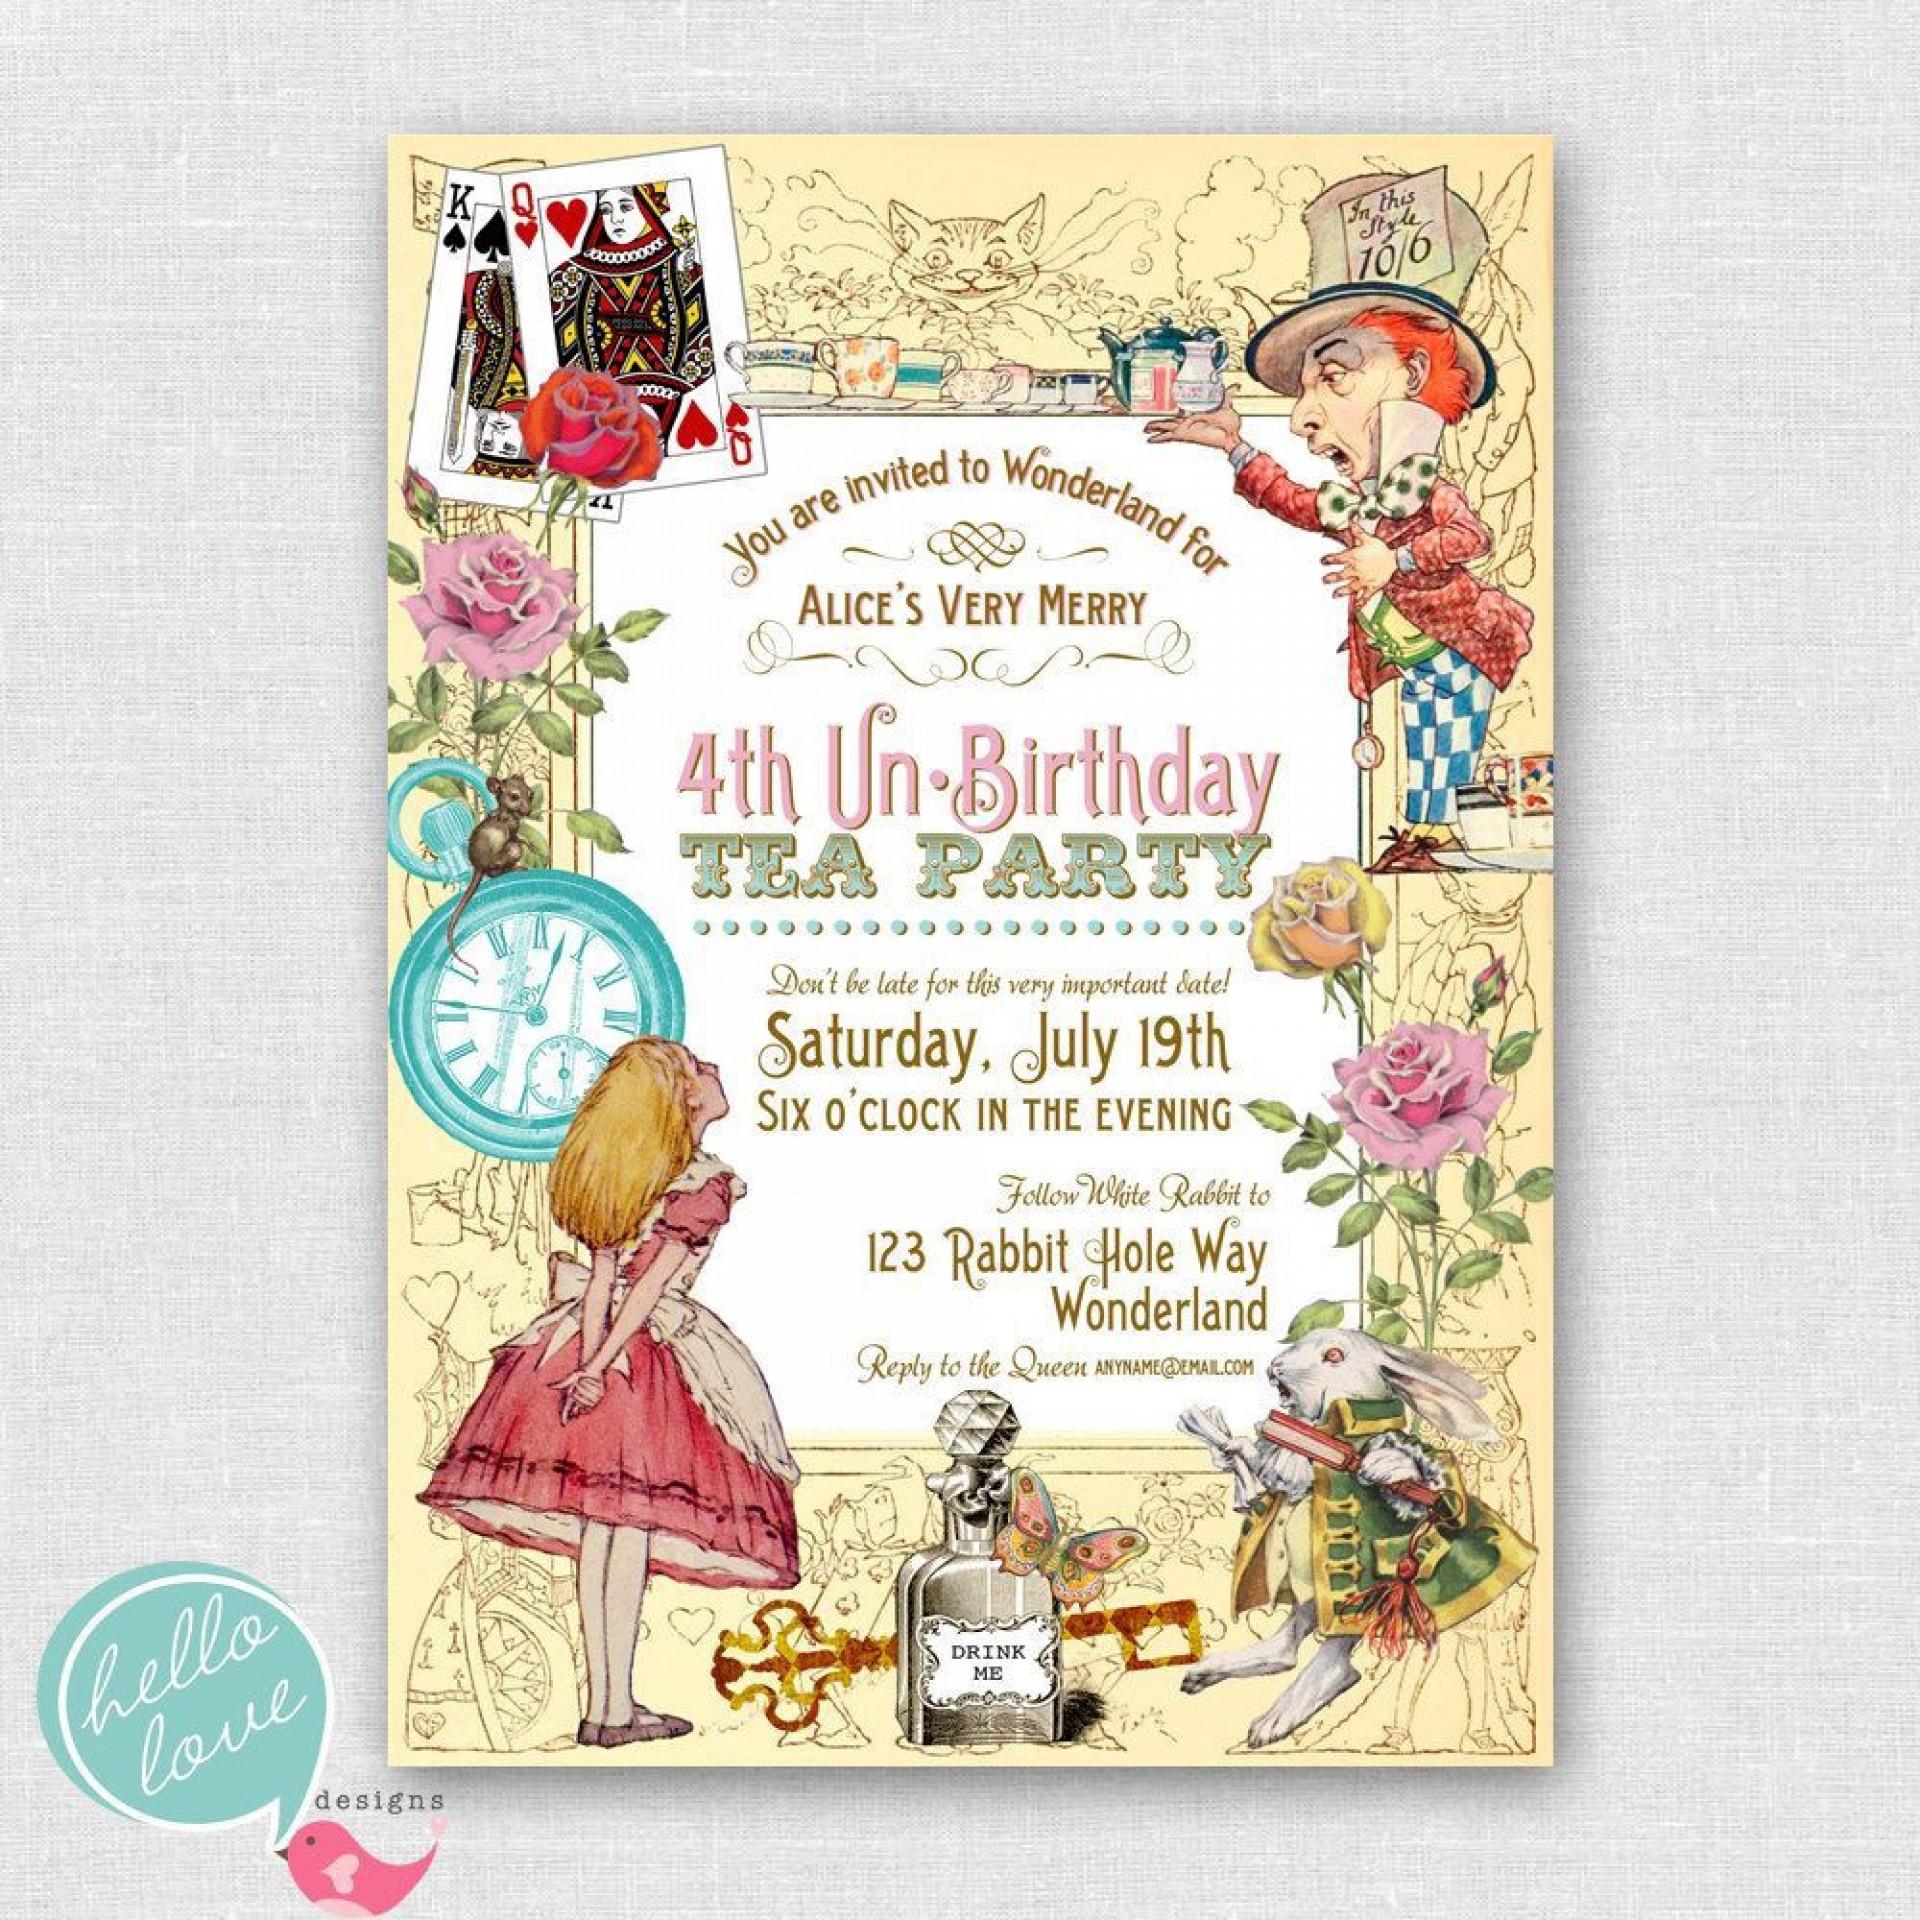 004 Stirring Alice In Wonderland Invitation Template Download High Definition  Free1920